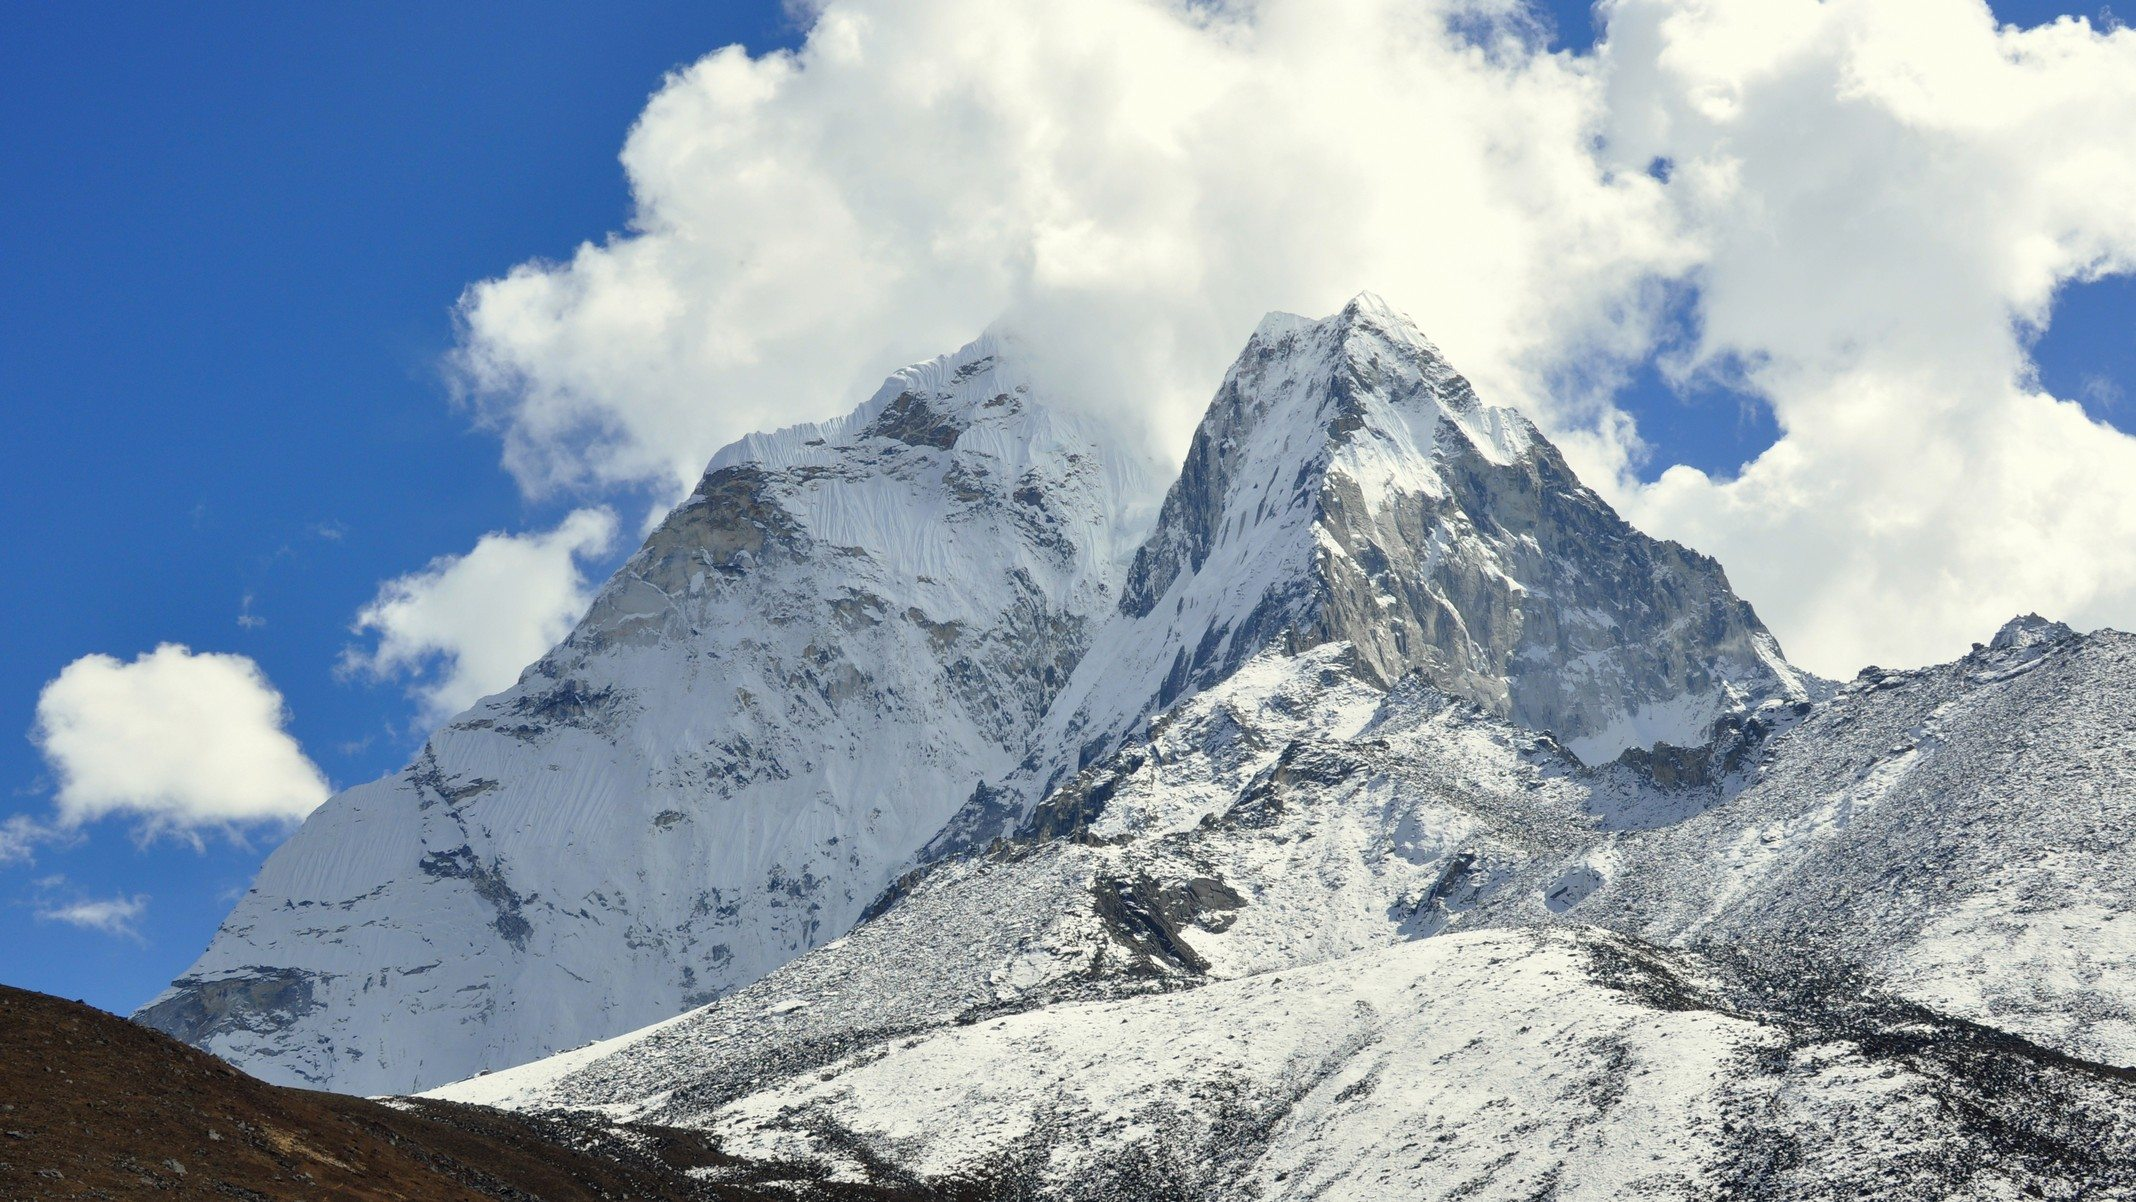 Trek du camp de base de l'Everest, Ama Dablam